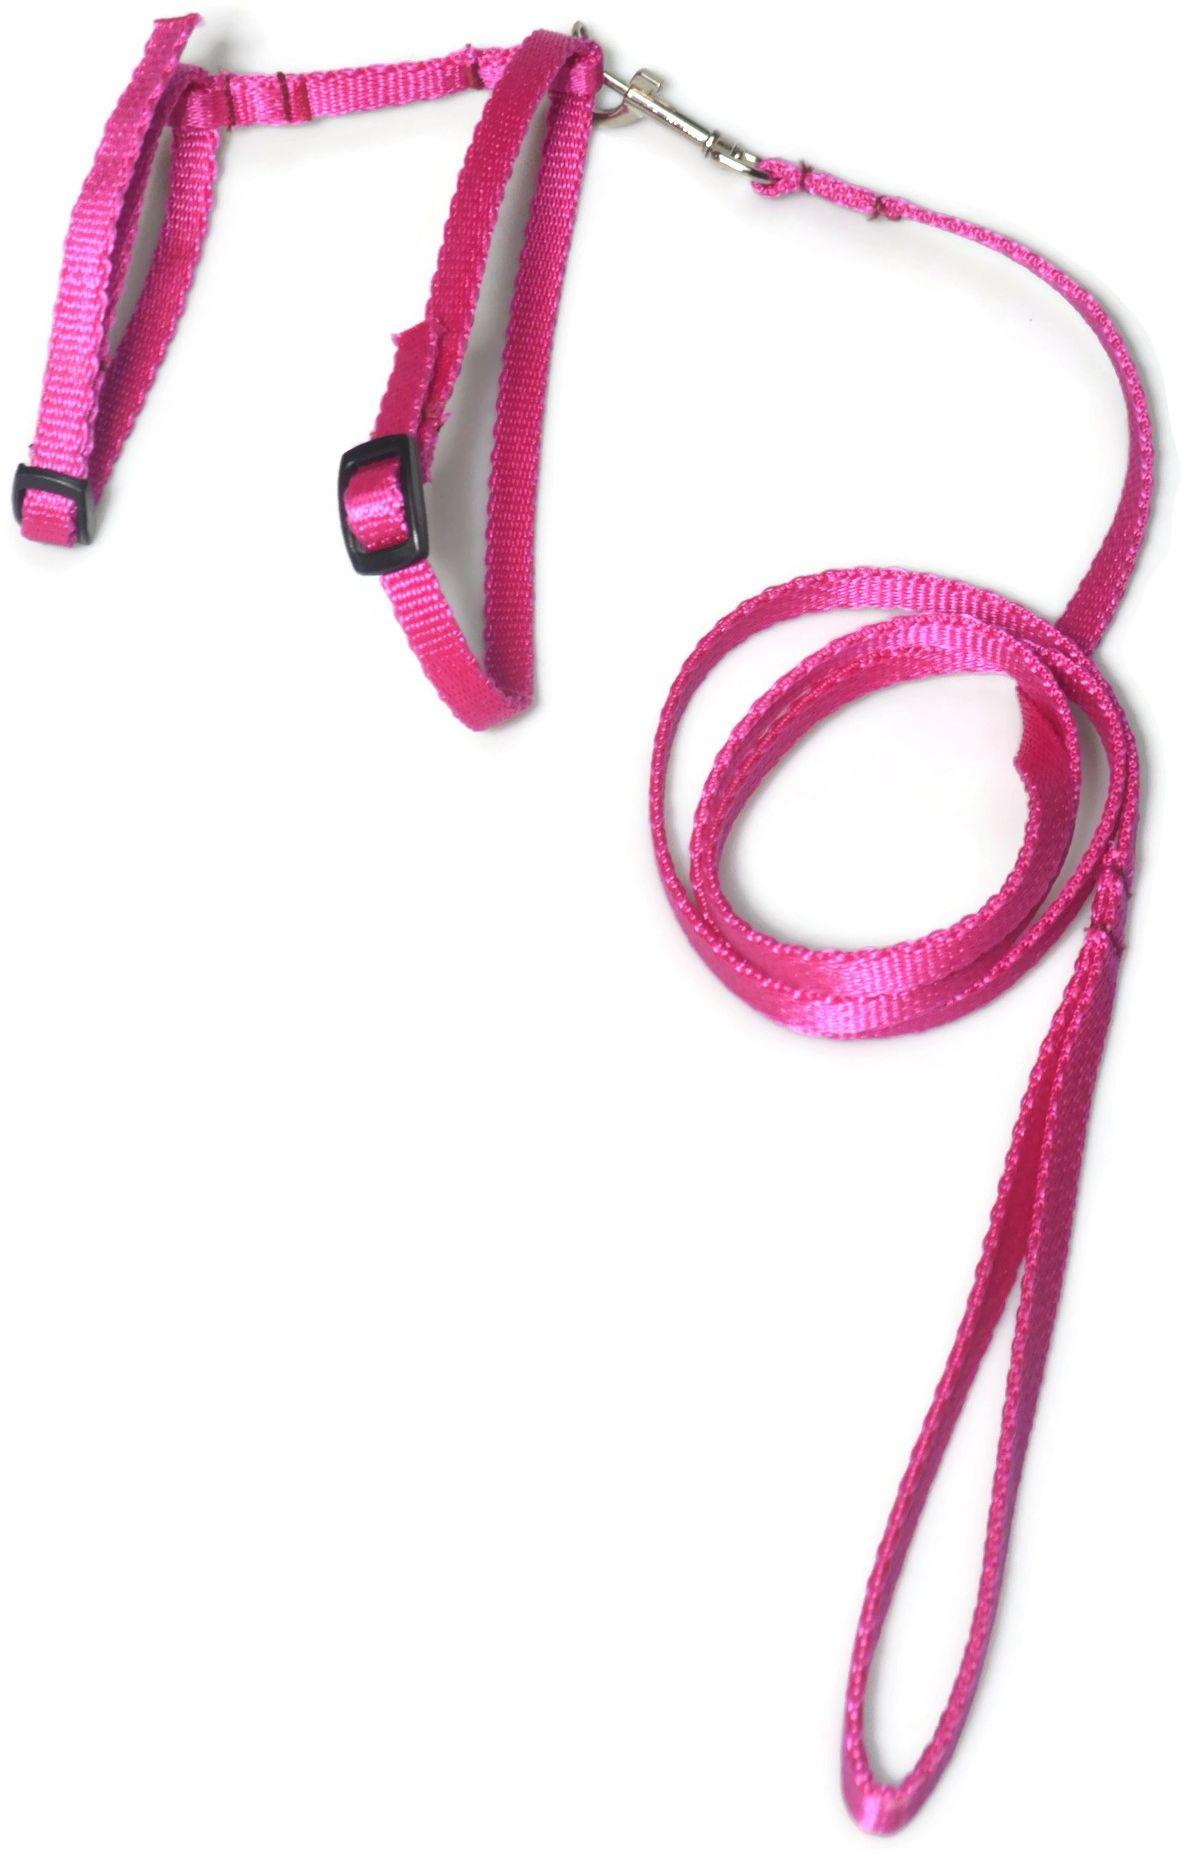 A-059 KOMPLET DLA KOTA V.2 : Kolor - Różowy - ALIZOO